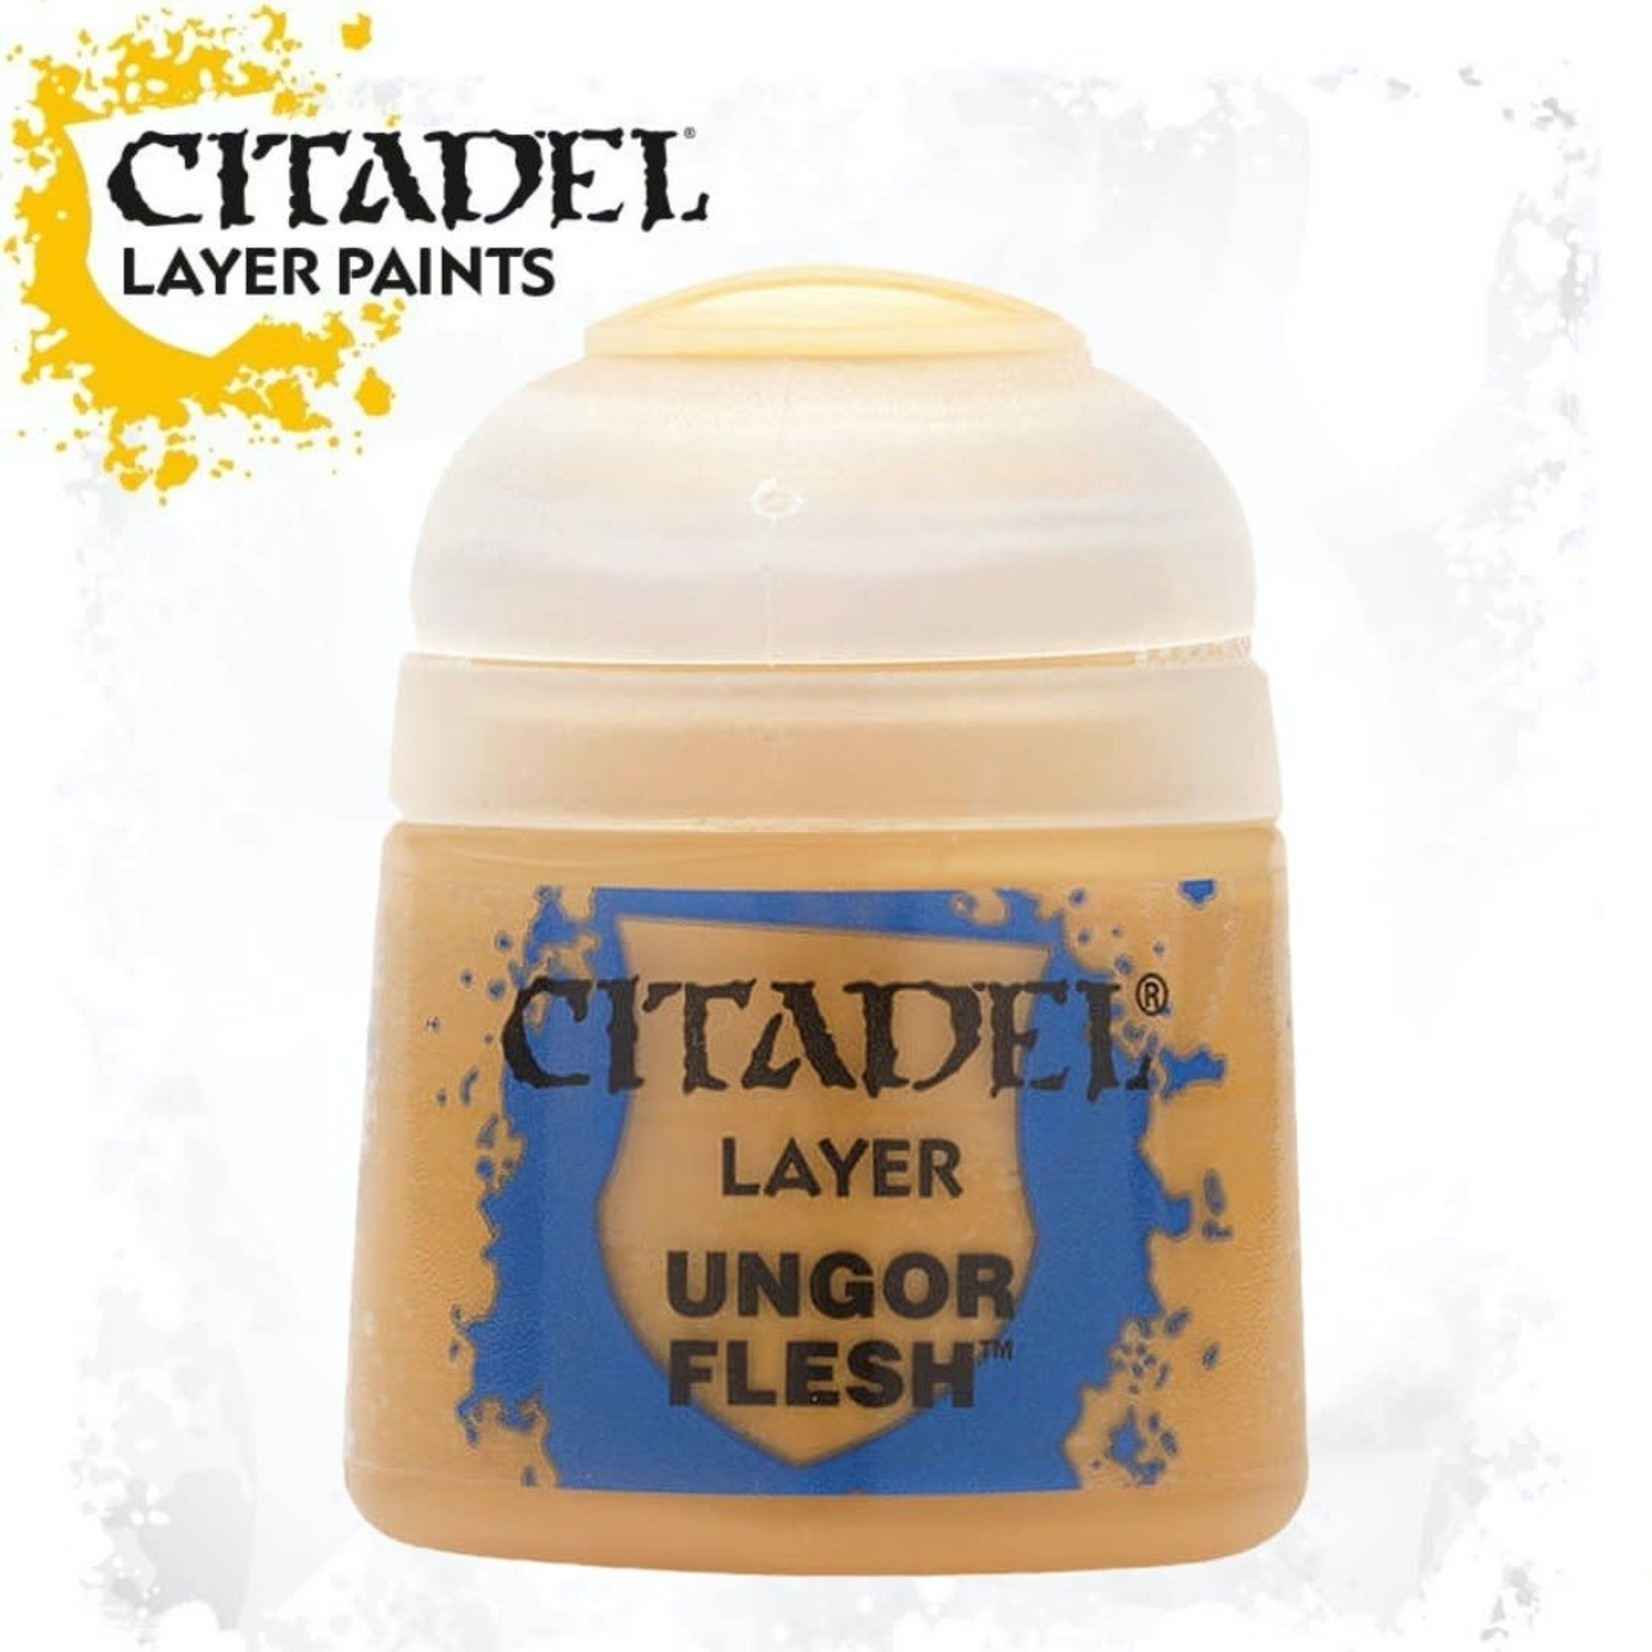 Citadel Citadel Paint - Layer: Ungor Flesh